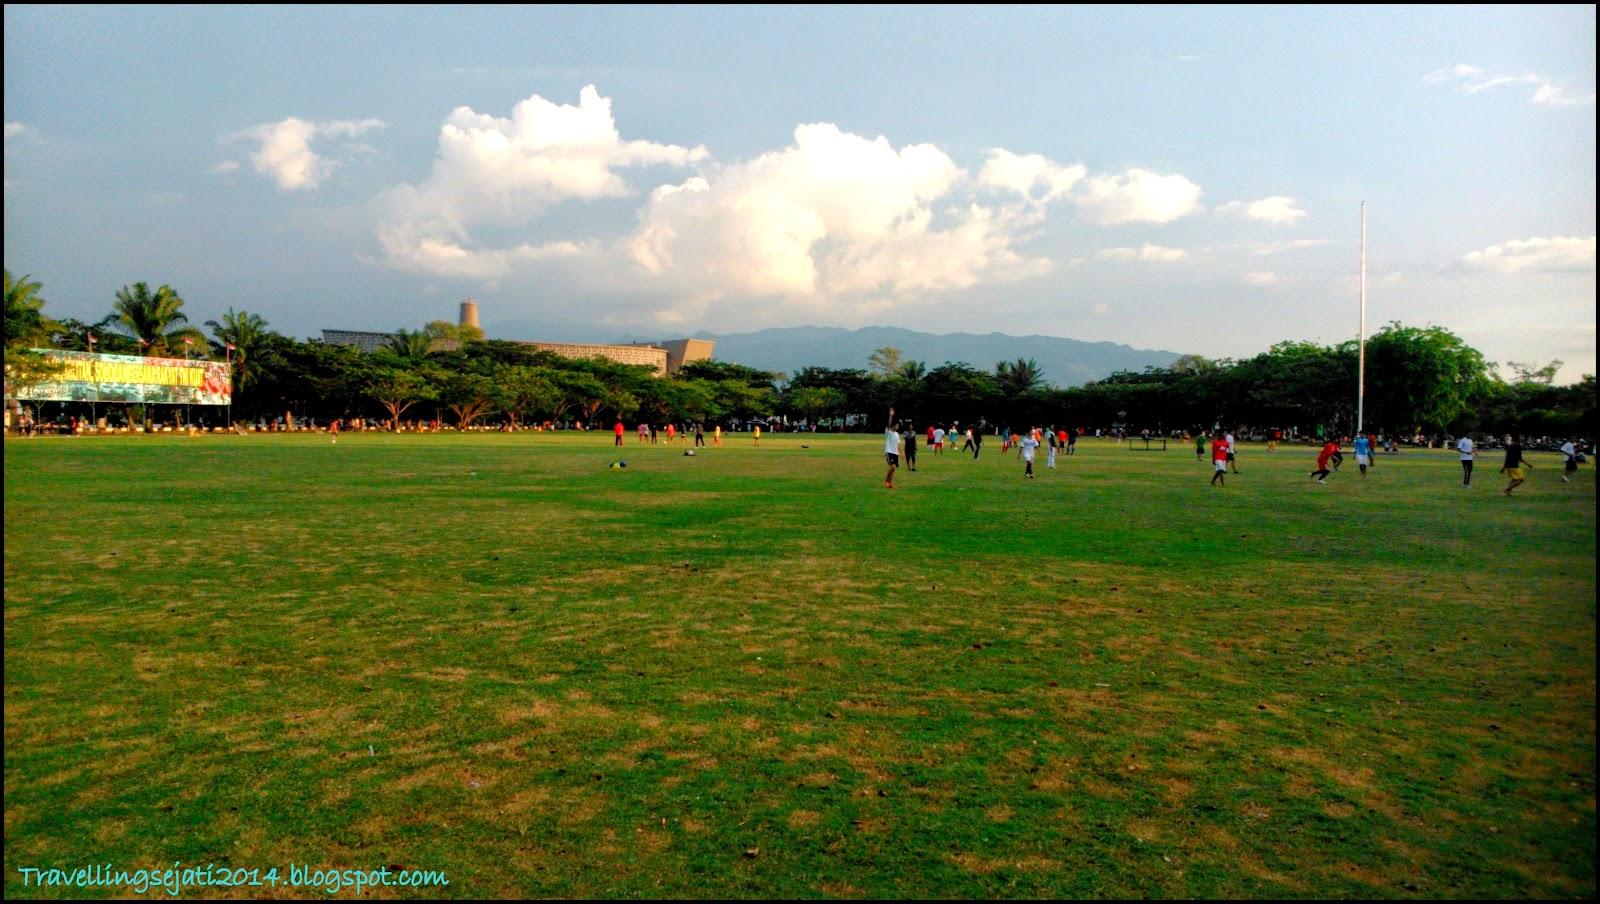 Lapangan Bersejarah Terletak Pusat Kota Banda Aceh Blang Padang